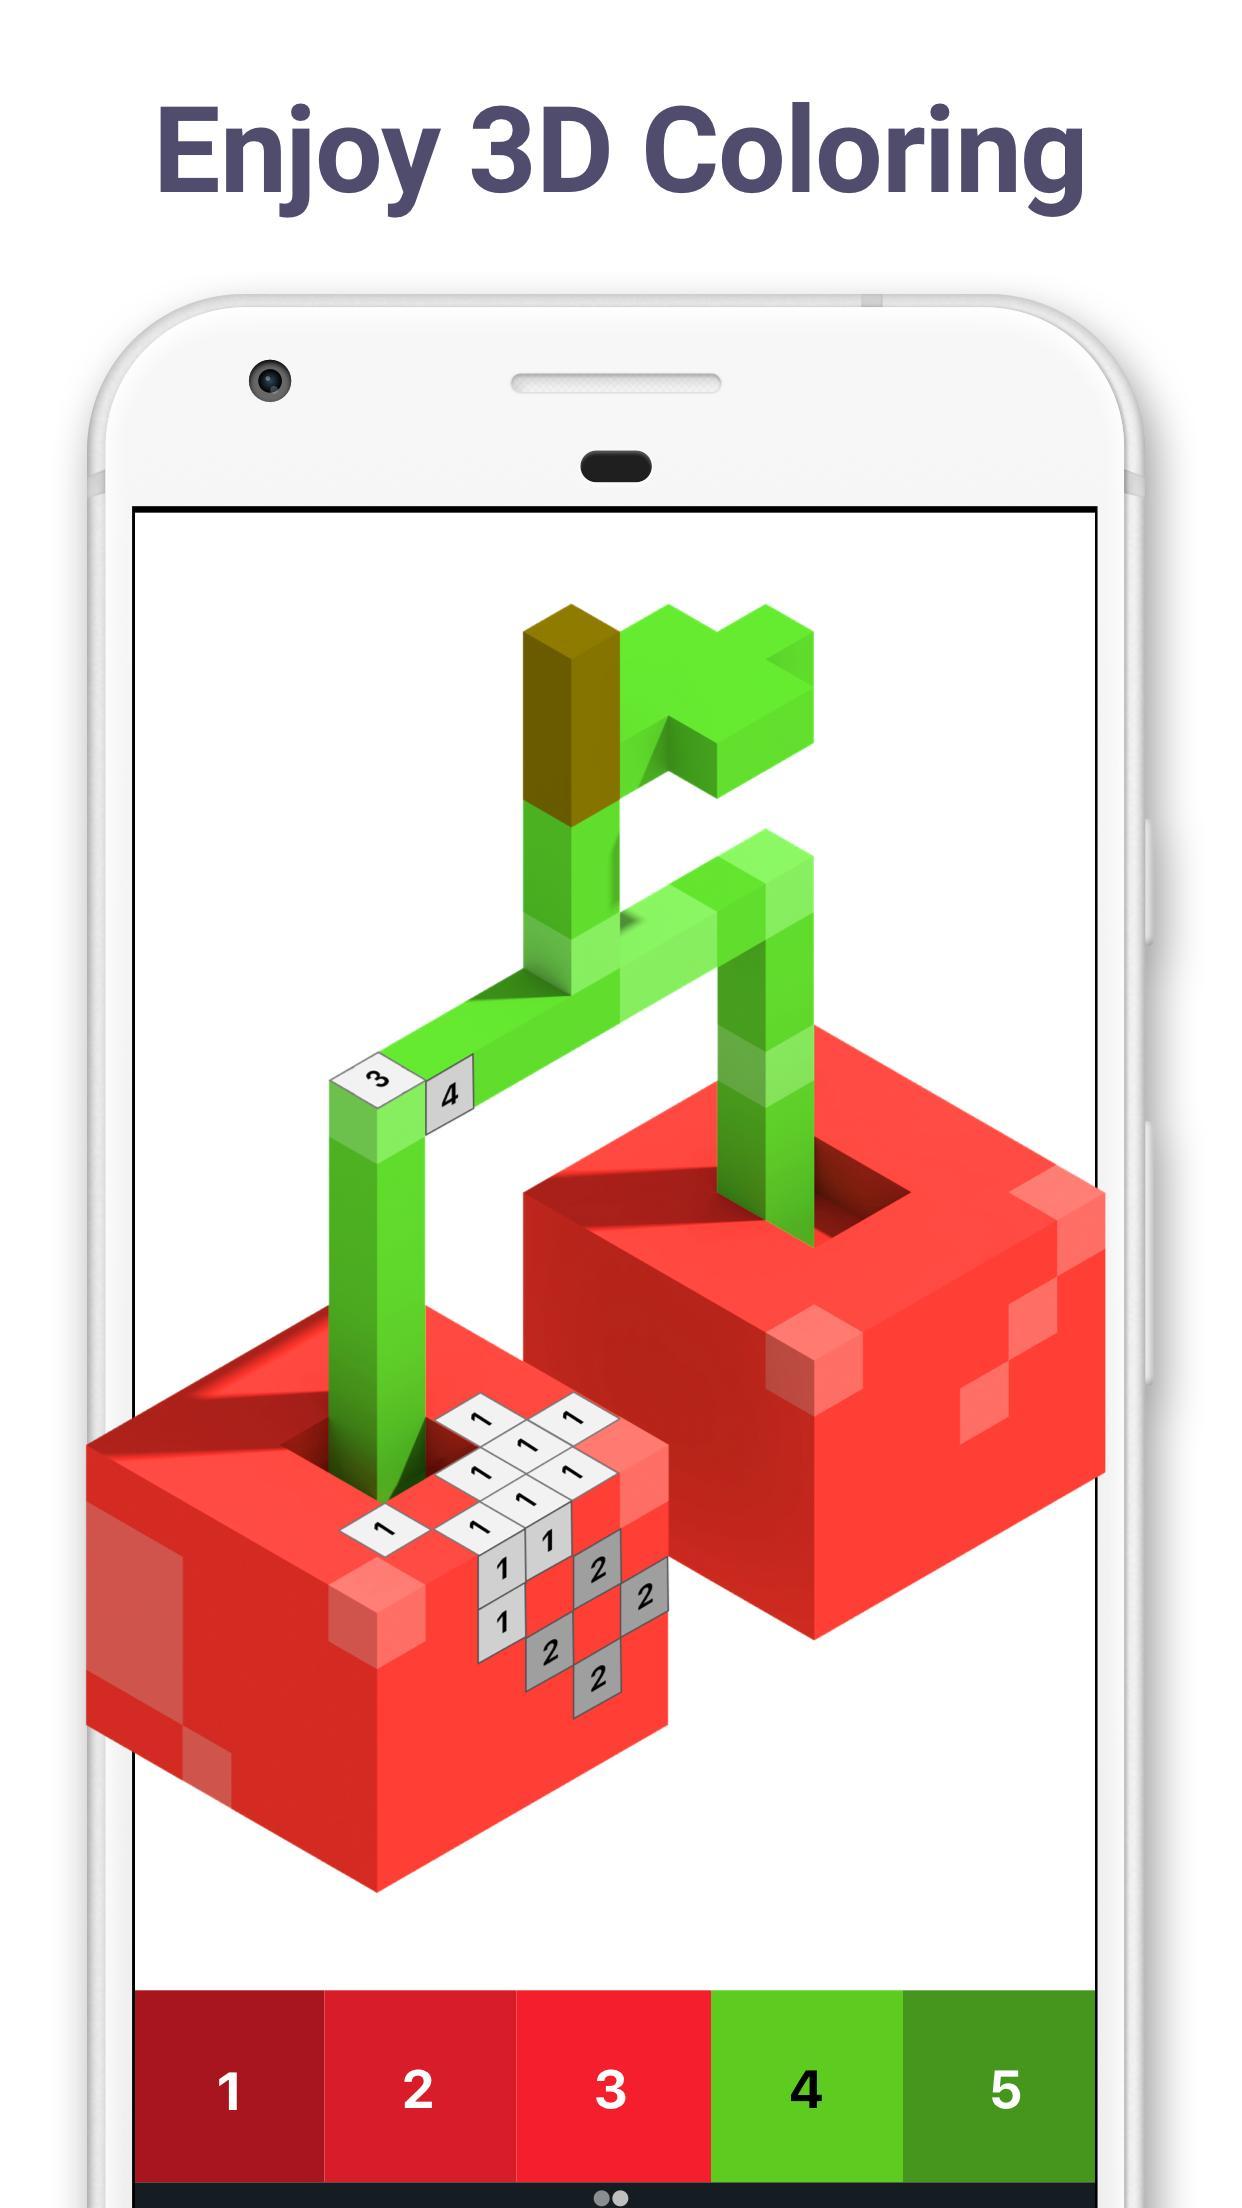 Pixel Art Color by Number 6.6.1 Screenshot 7